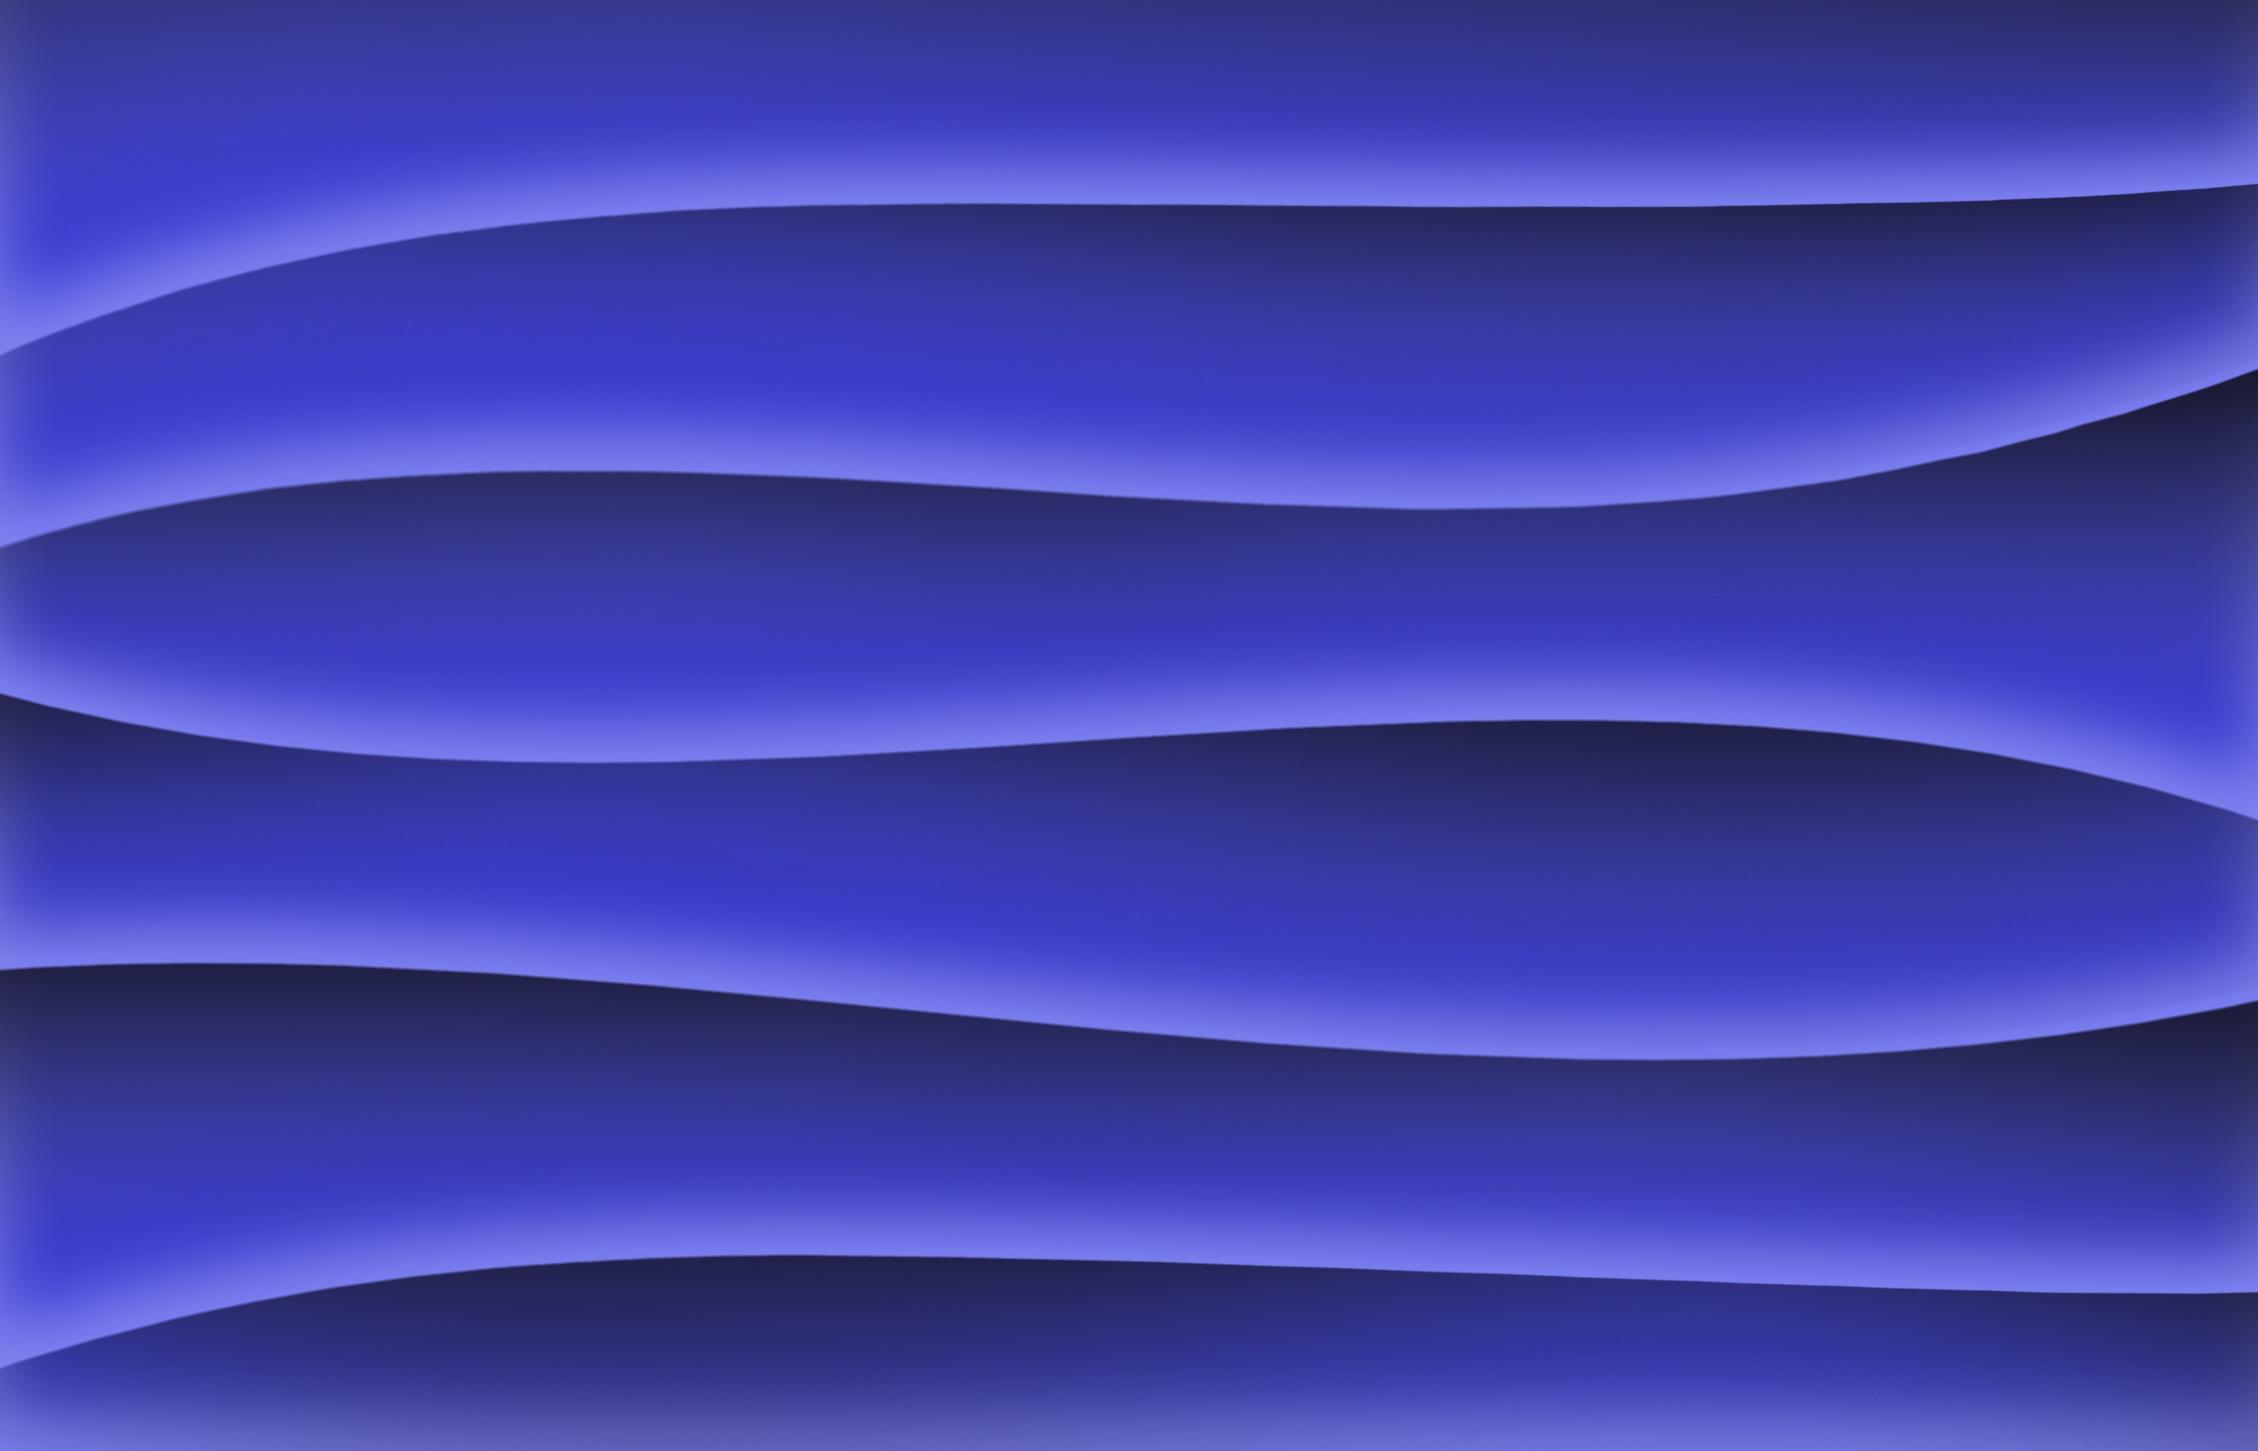 Blue waves wallpaper, Abstract, Art, Wave, Wallpaper, HQ Photo